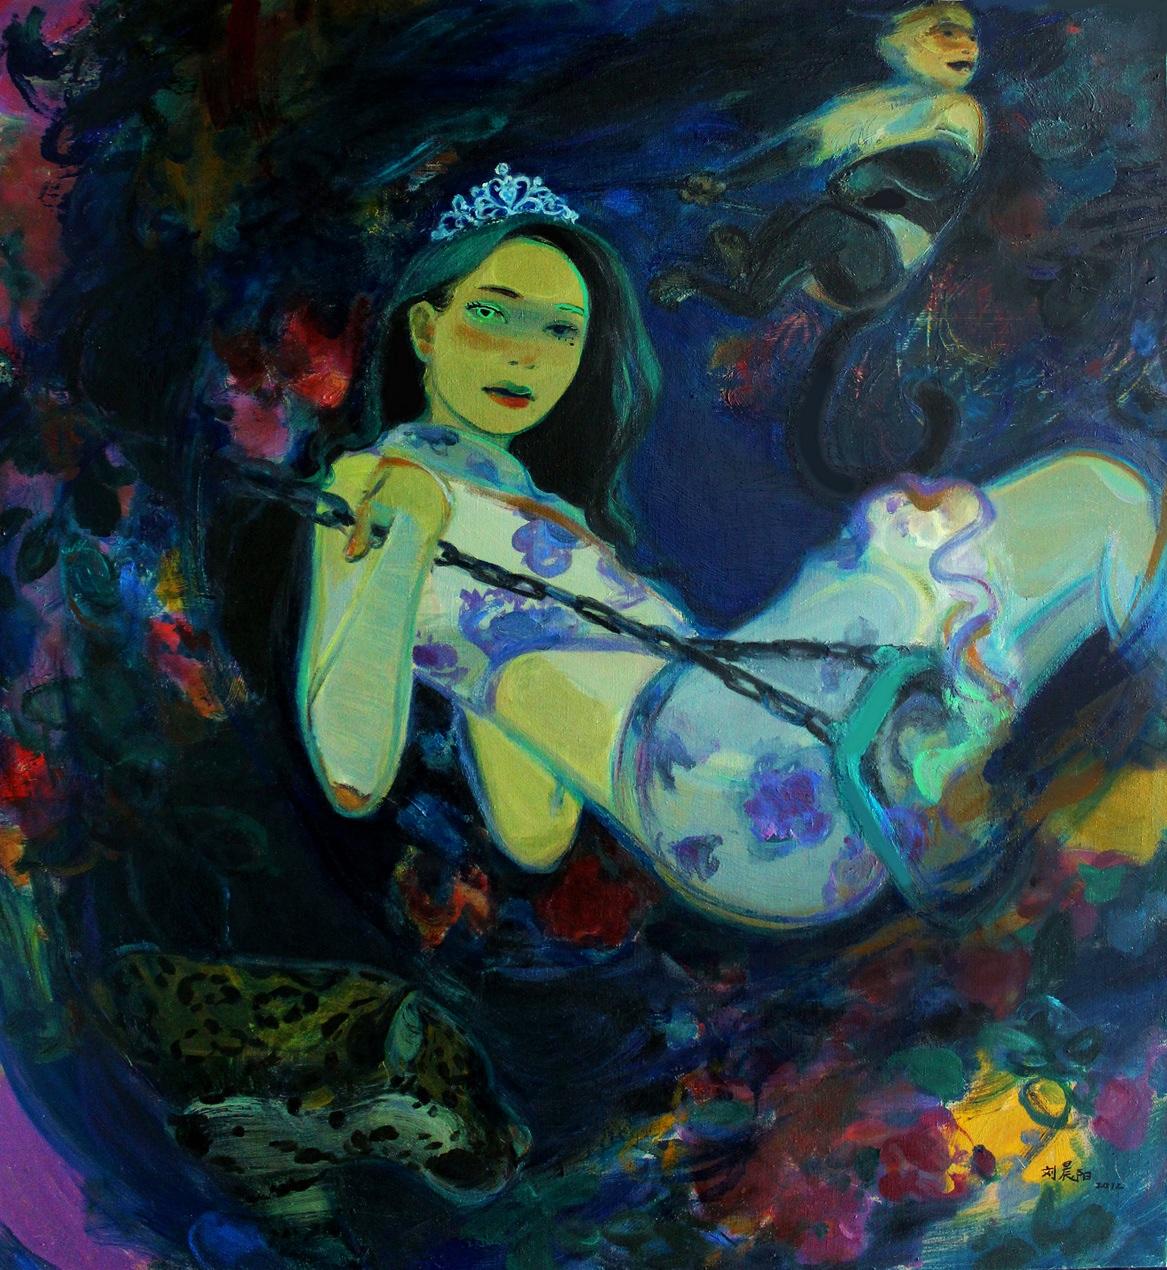 """Princess"" Oil on Canvas 120 x 130 cm 2012"